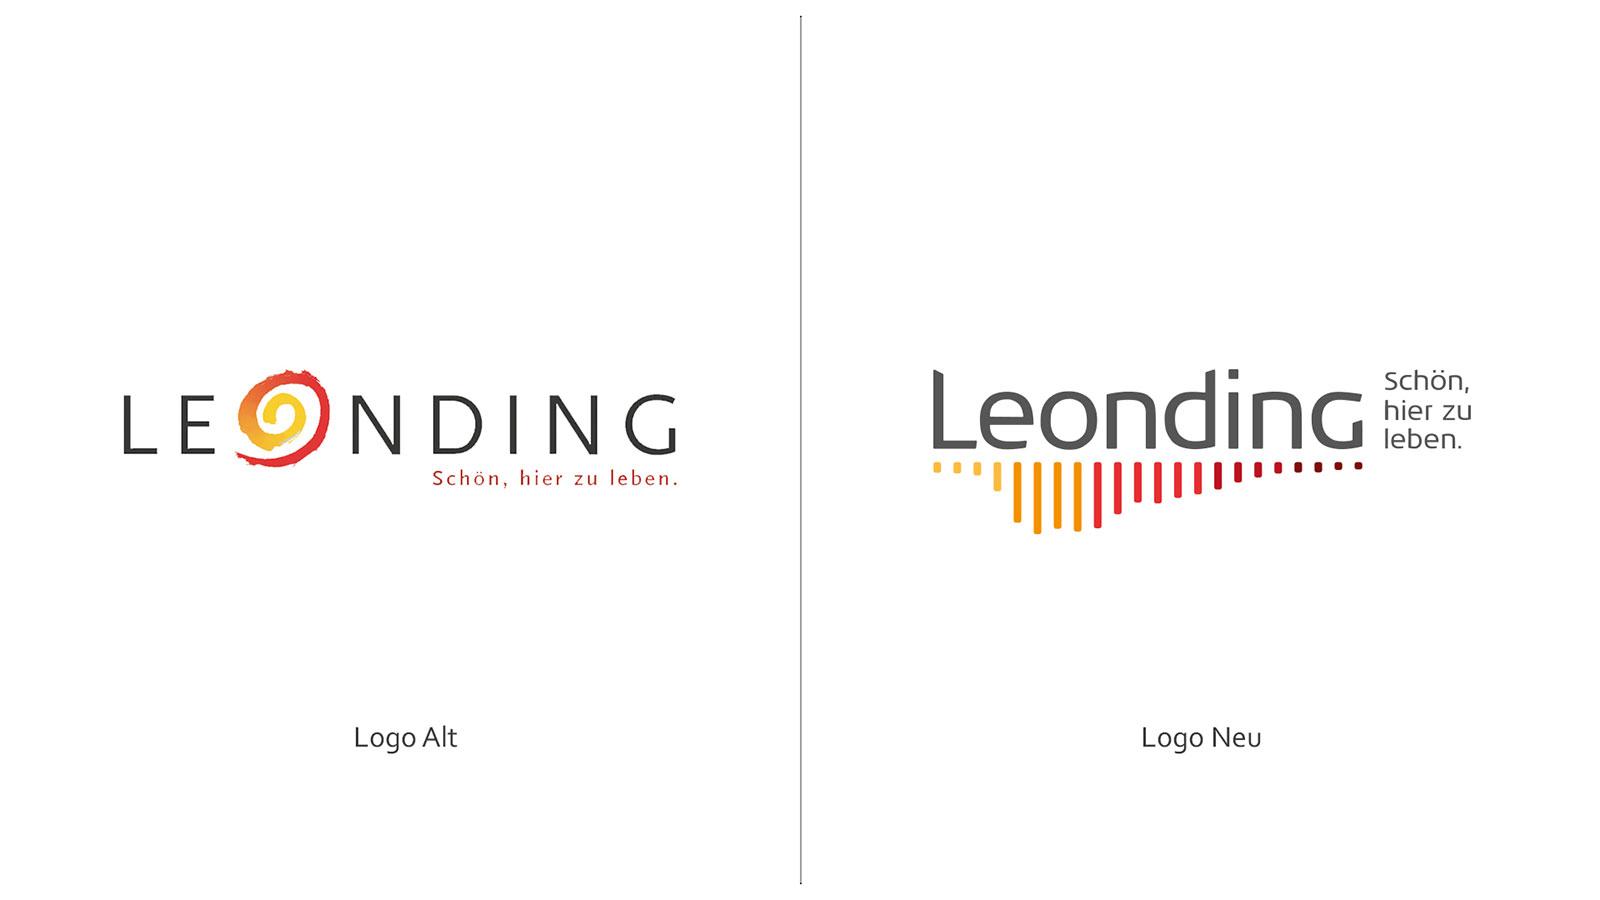 Leonding Logogegenüberstellung Alt - Neu